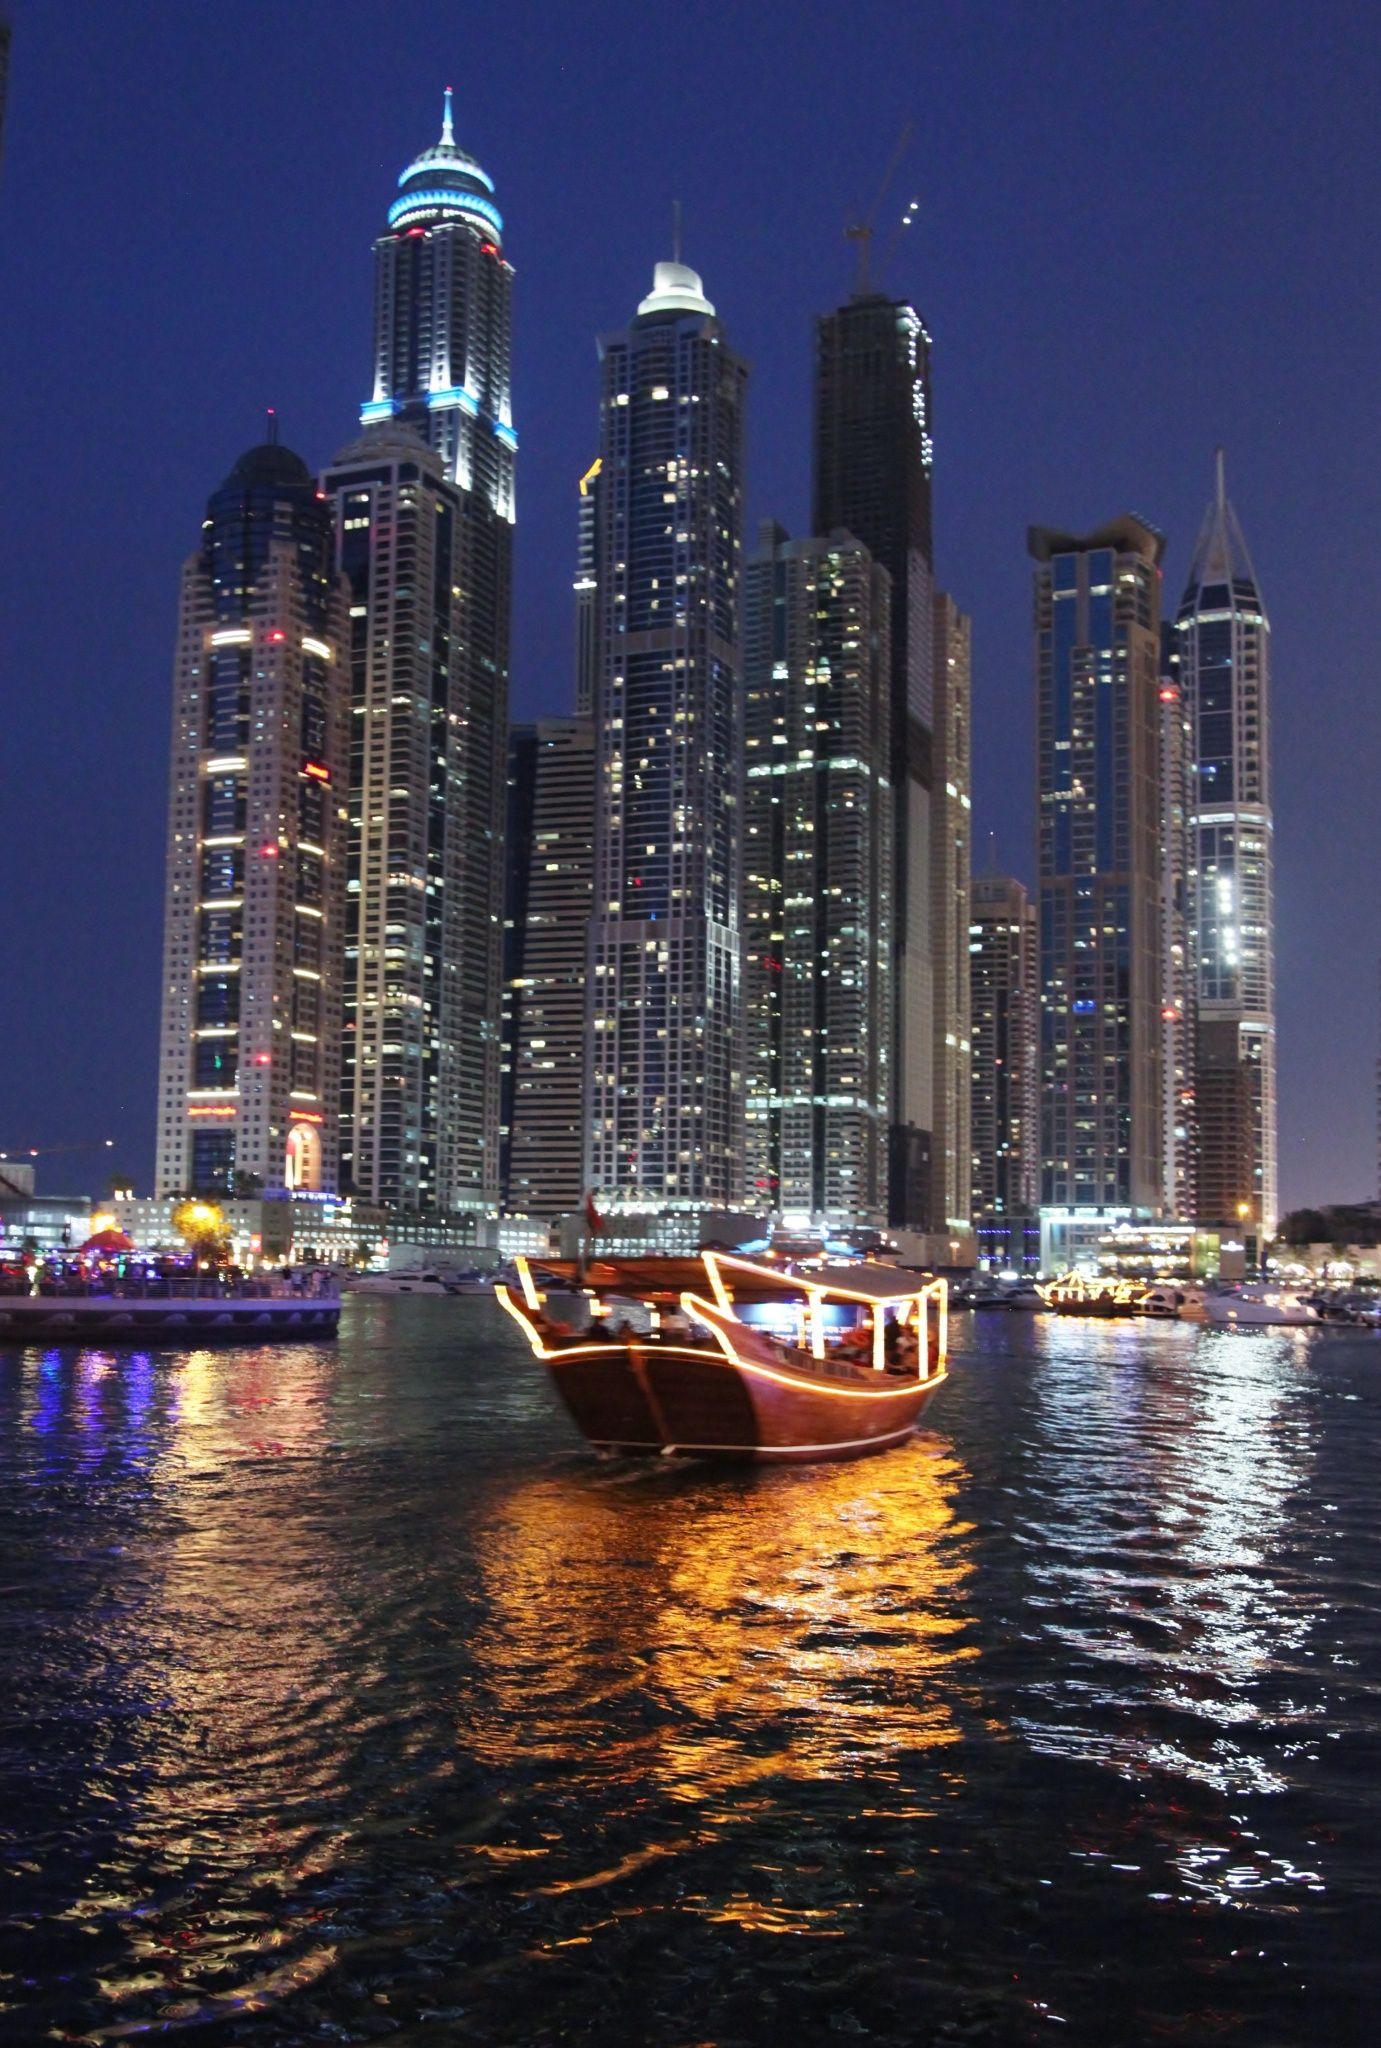 Noche de Dubai Marina, Emiratos Árabes Unidos / por Ranjit Pol